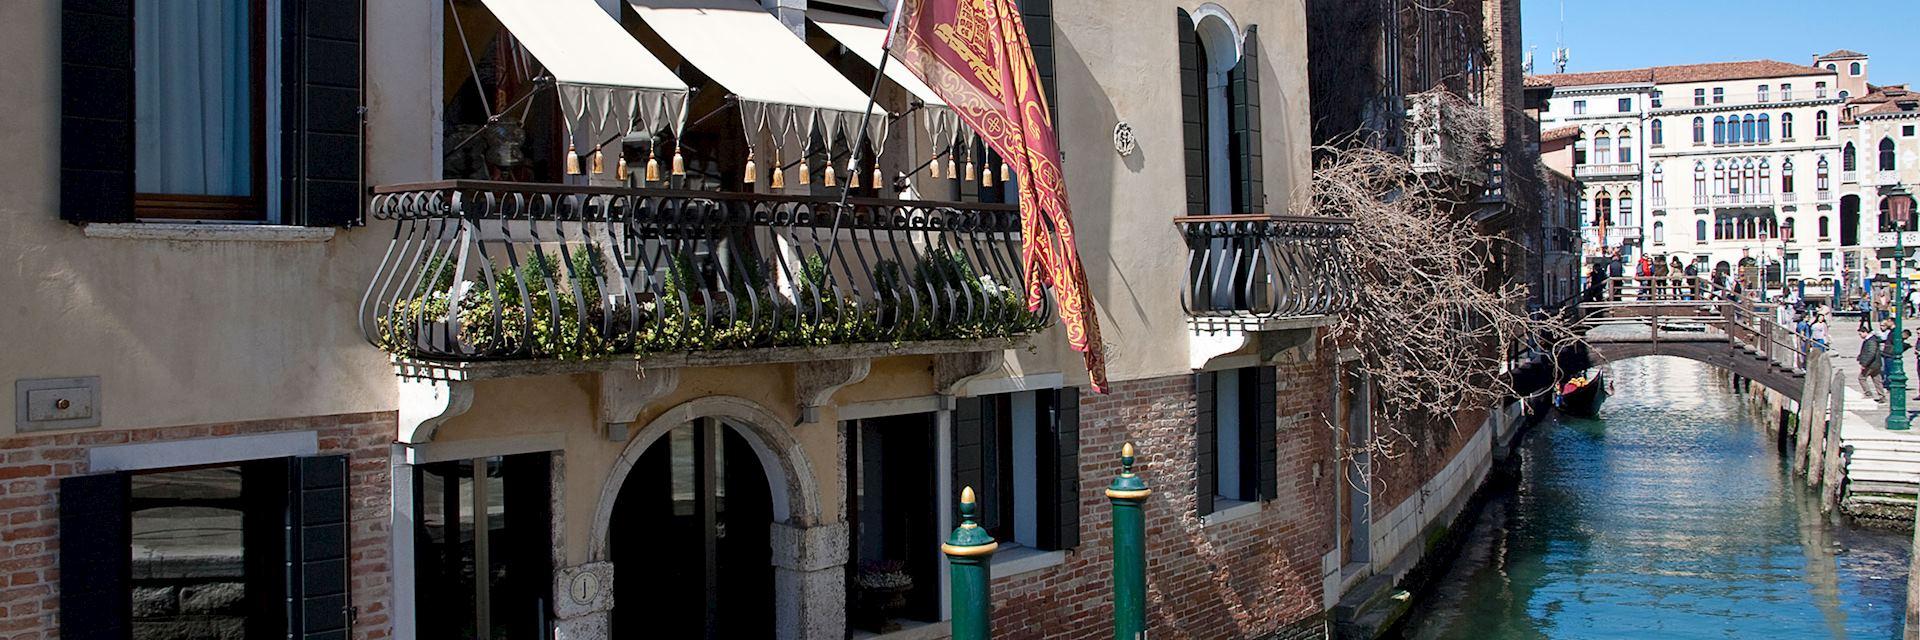 Ca Maria Adele, Venice